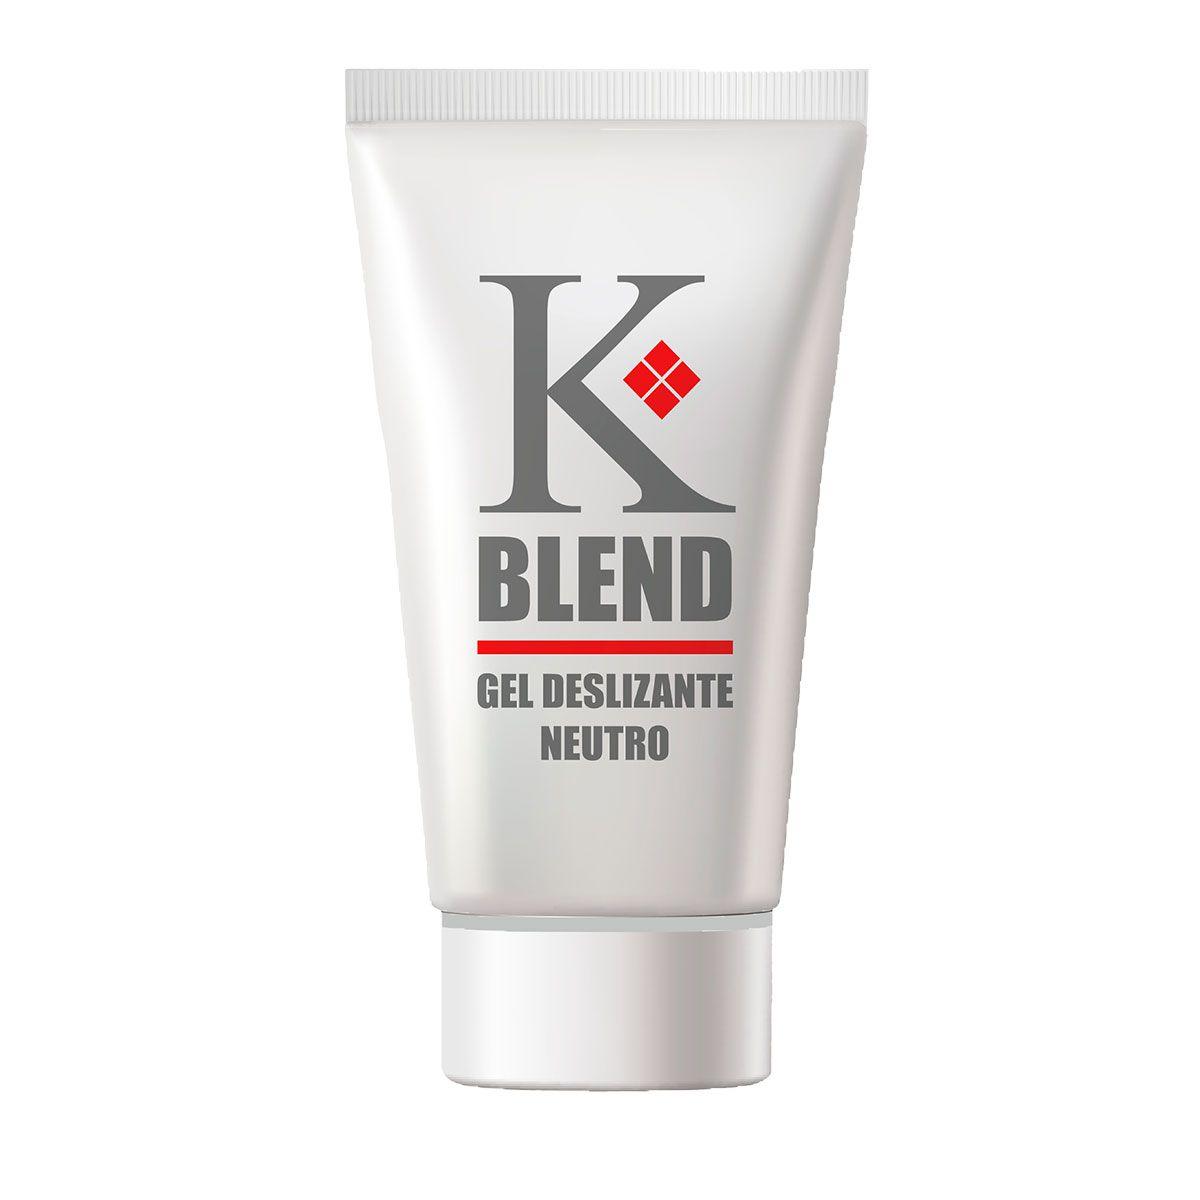 K-BLEND 25g - Gel Deslizante Neutro